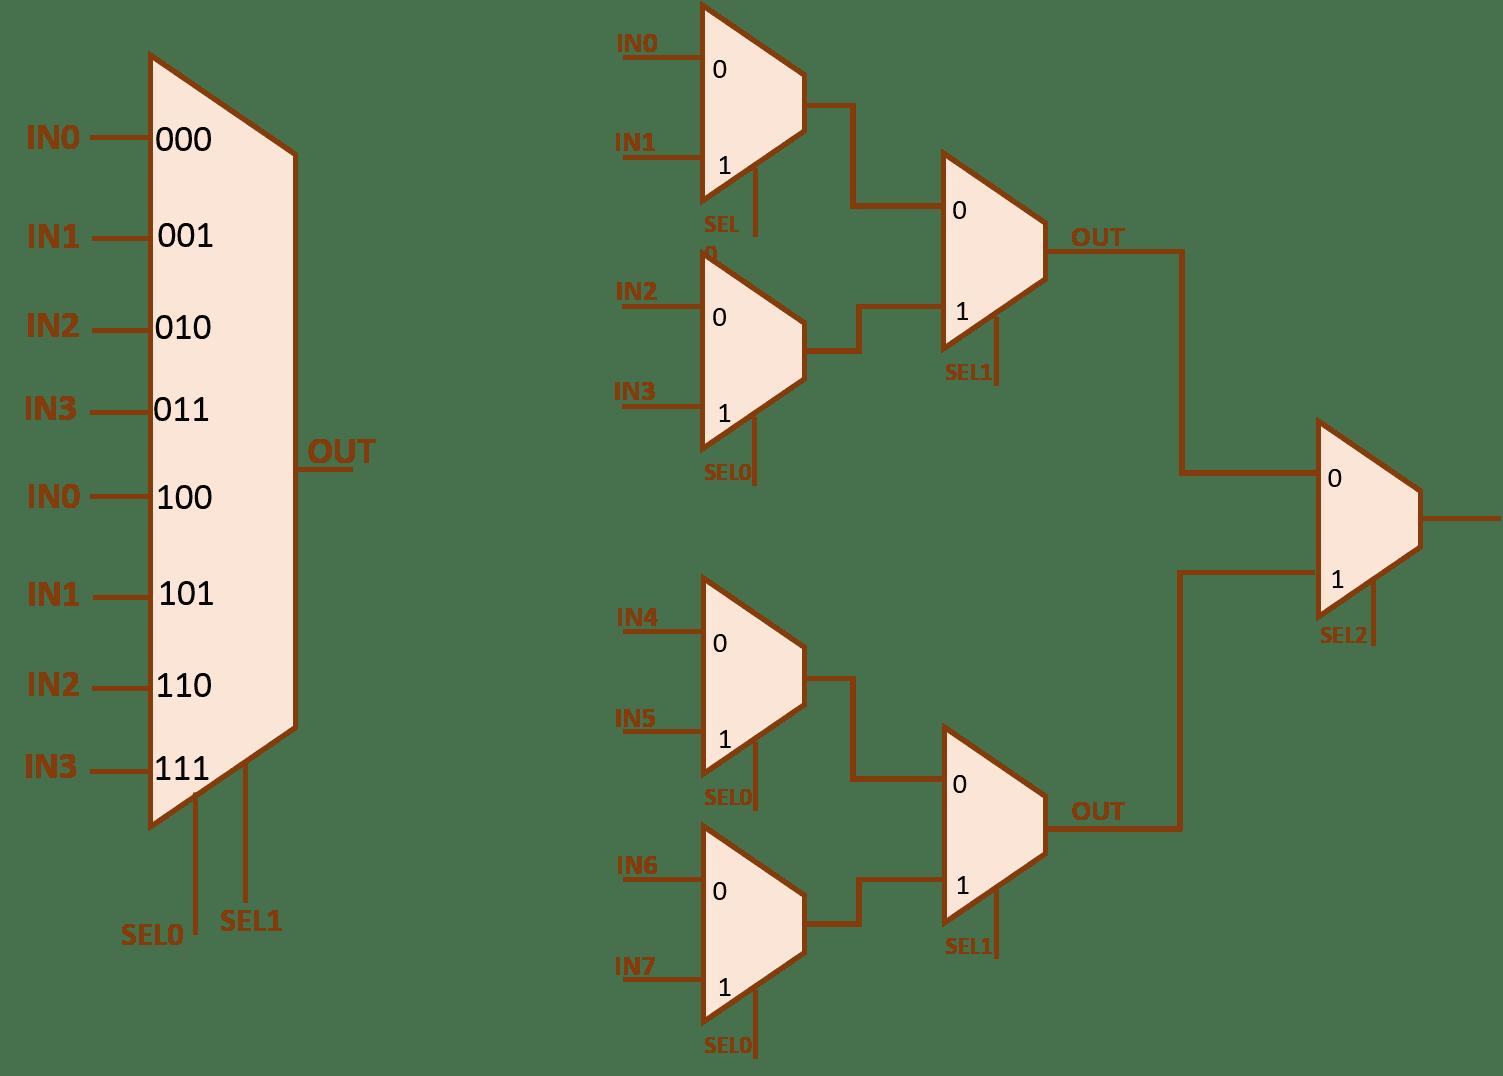 logic diagram of 8 to 1 multiplexer [ 1503 x 1076 Pixel ]